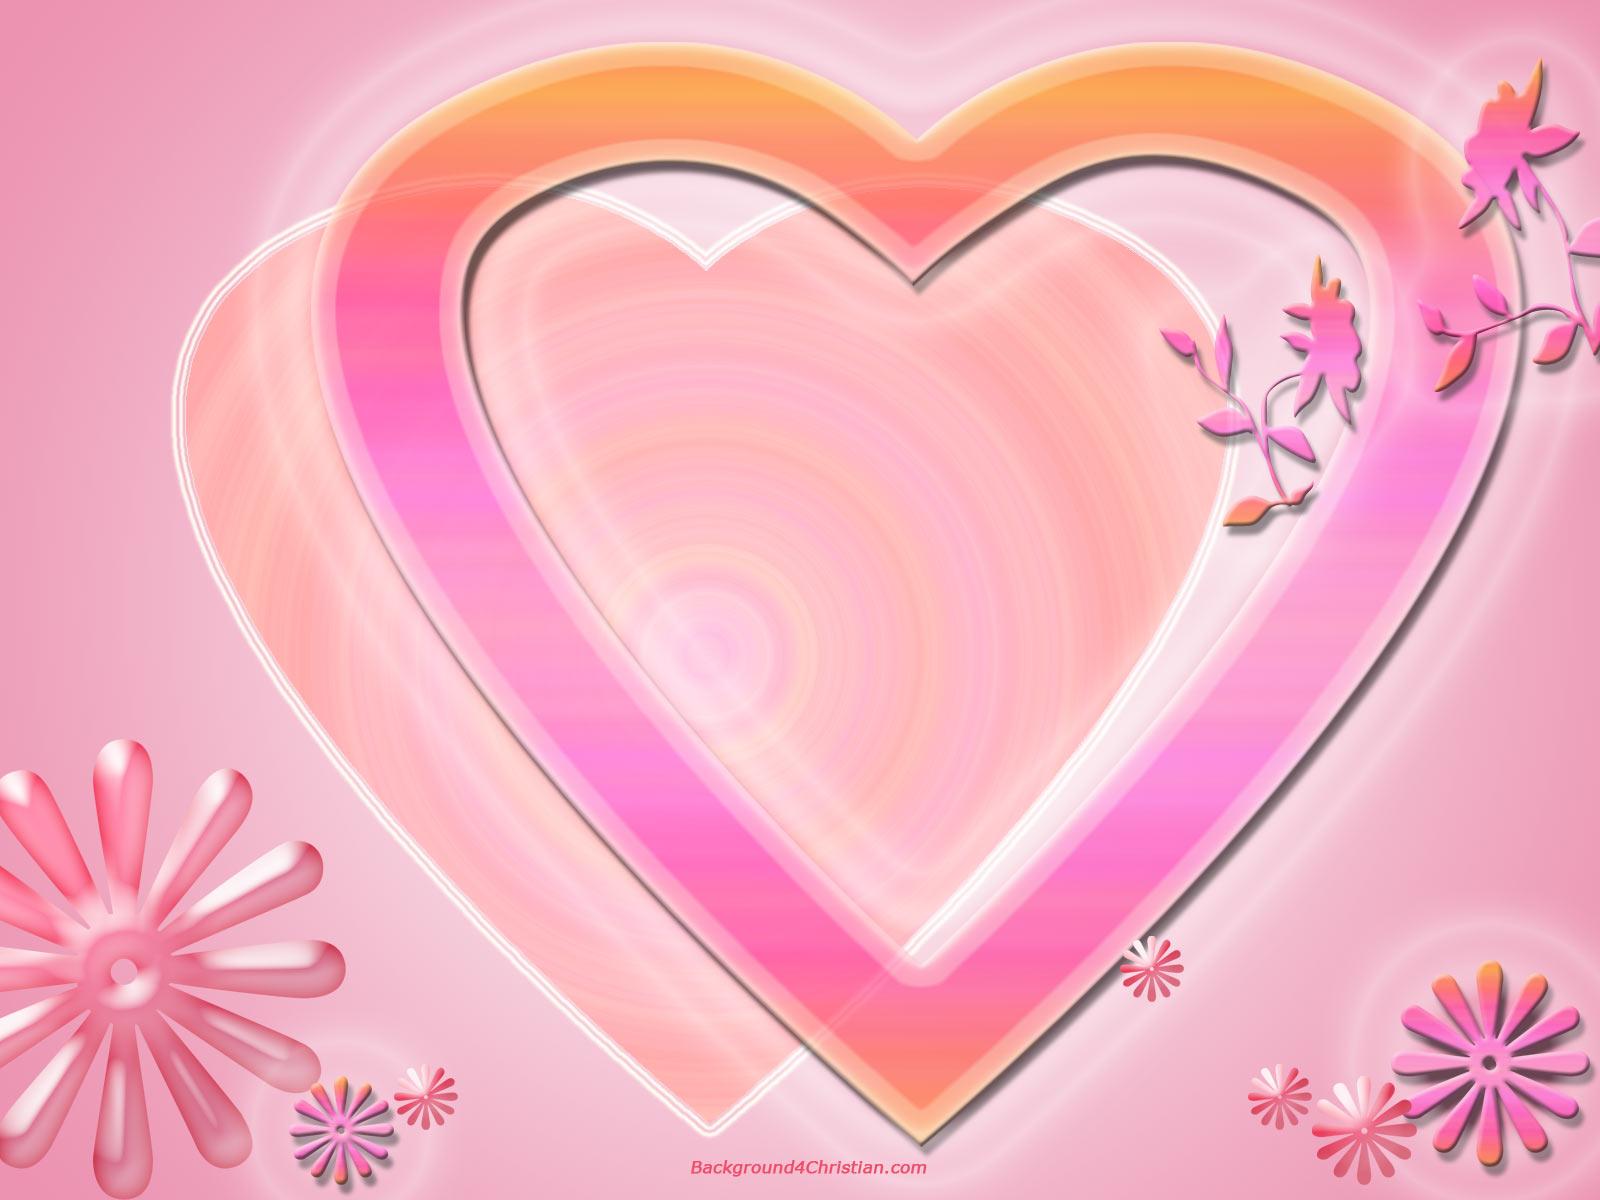 Download Hearts wallpaper pink valentine heart 1600x1200